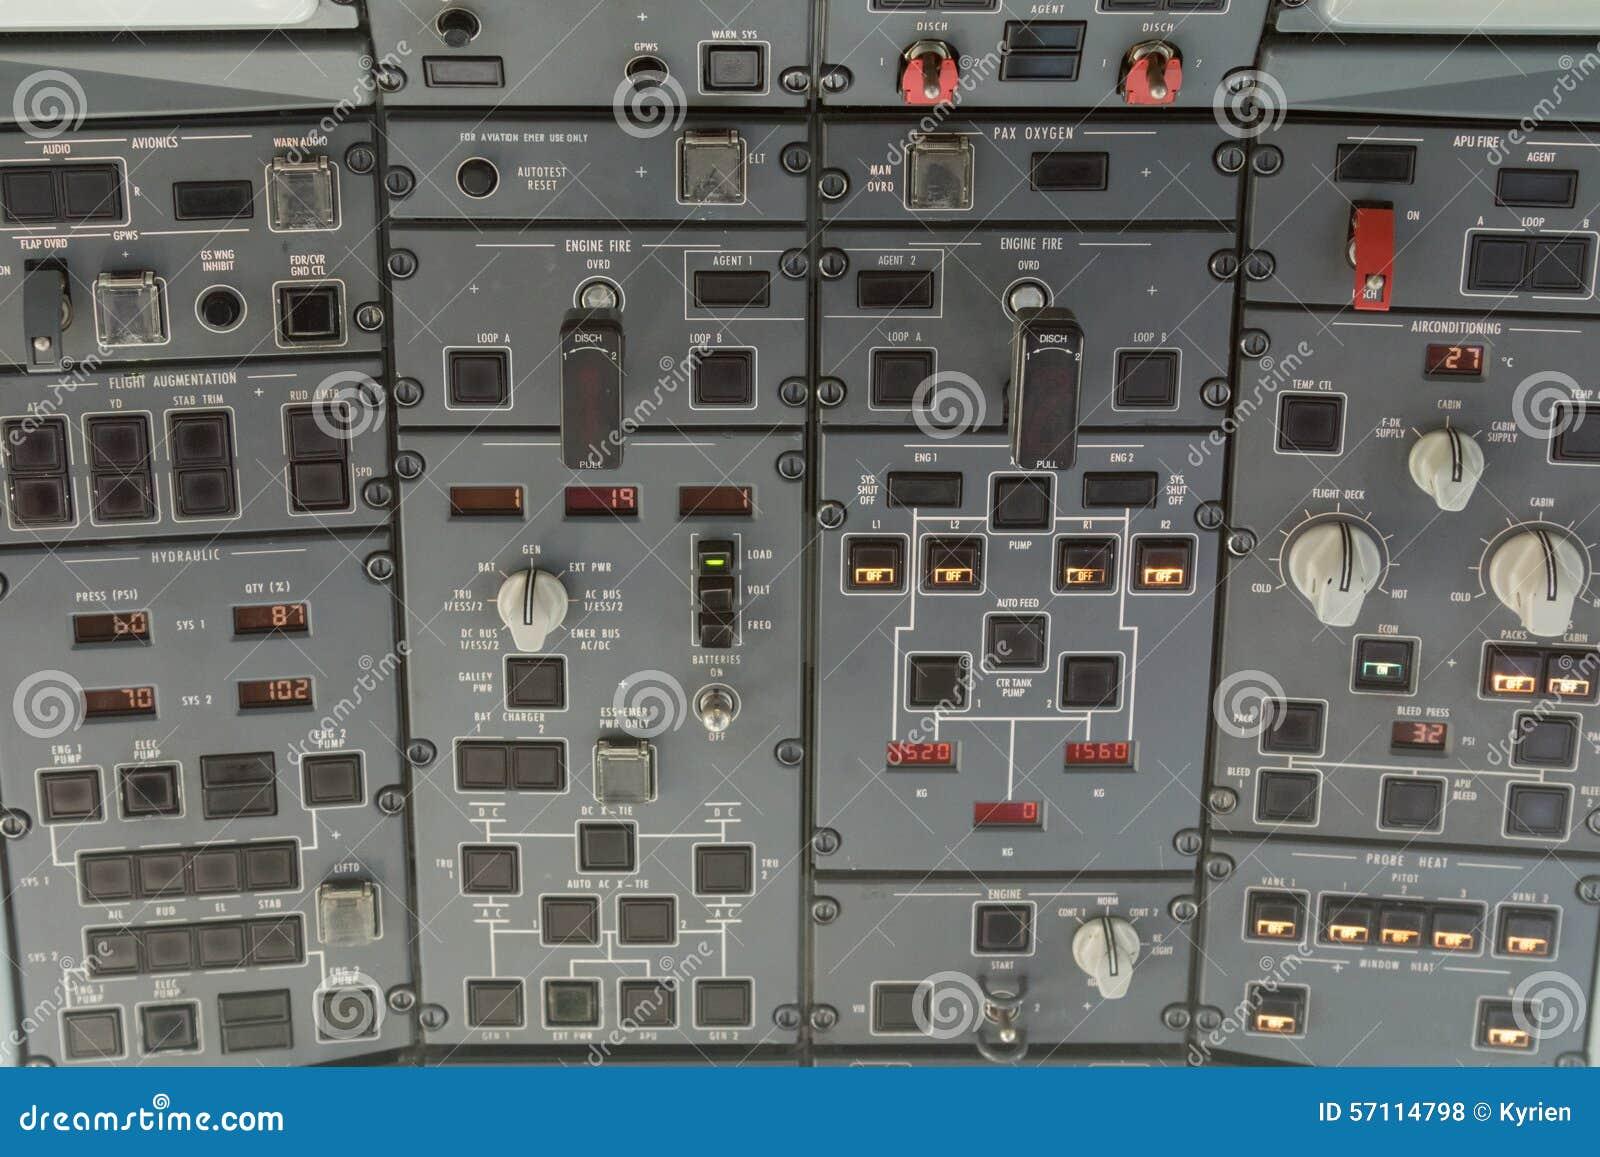 Overhead Plane Control Panel Stock Photo - Image of flight